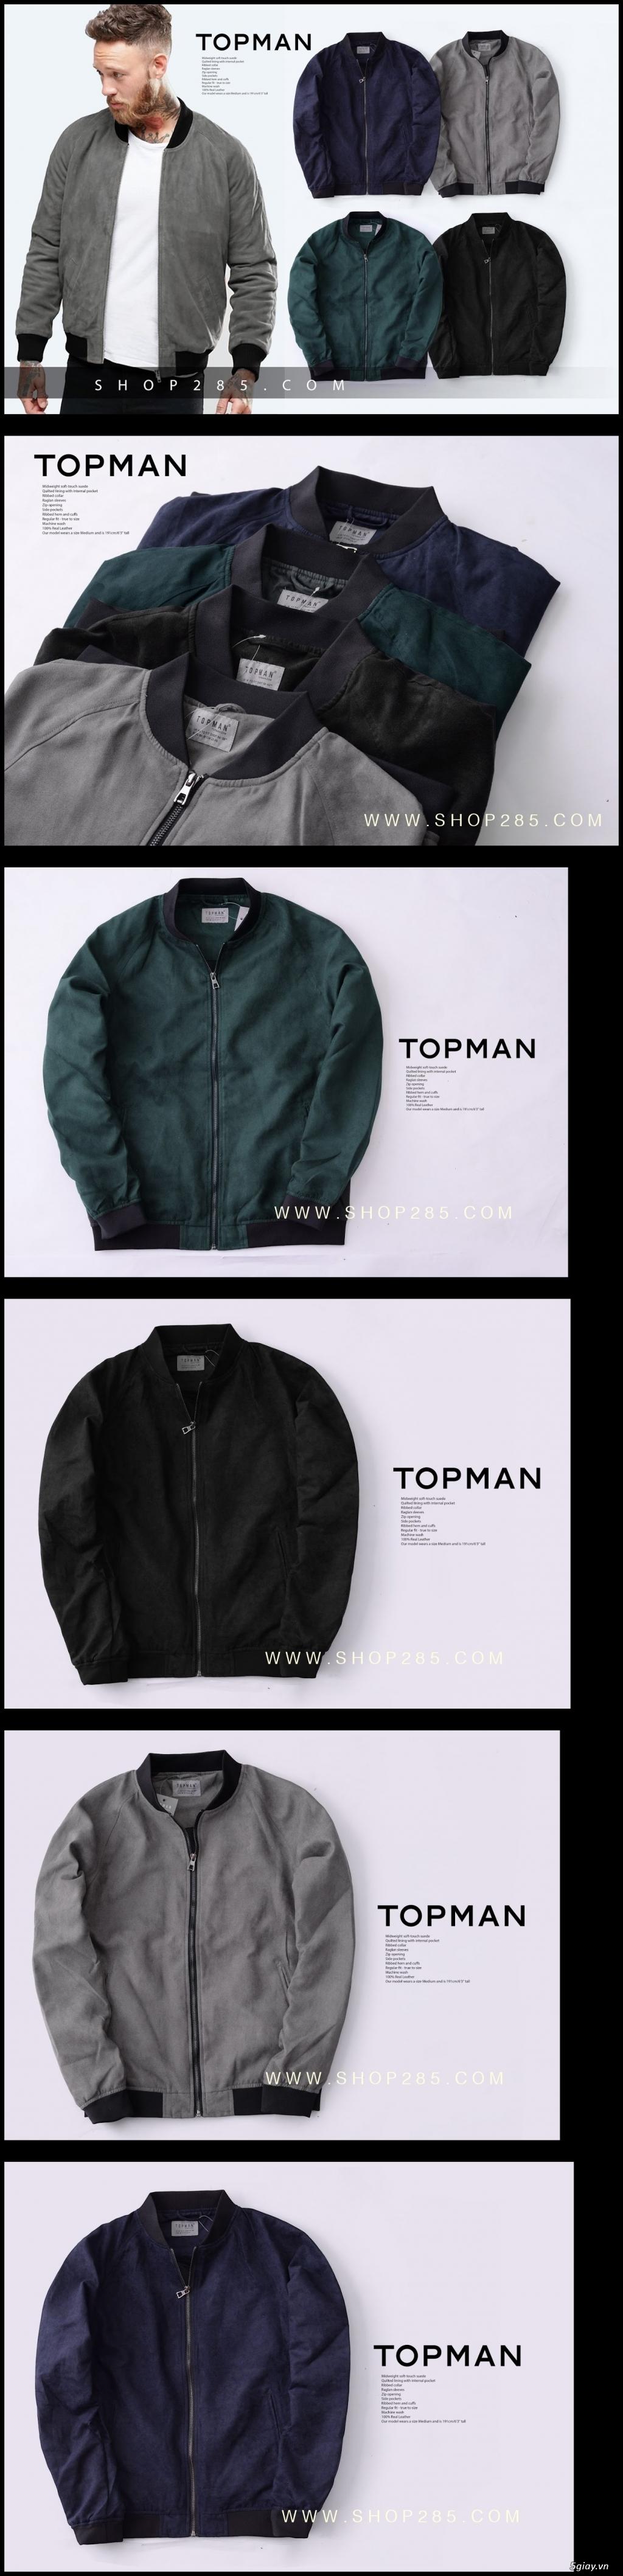 Shop285.com - Shop quần áo : Zara,Jules,Jake*s,,Hollister,Aber,CK,Tommy,Levis - 29